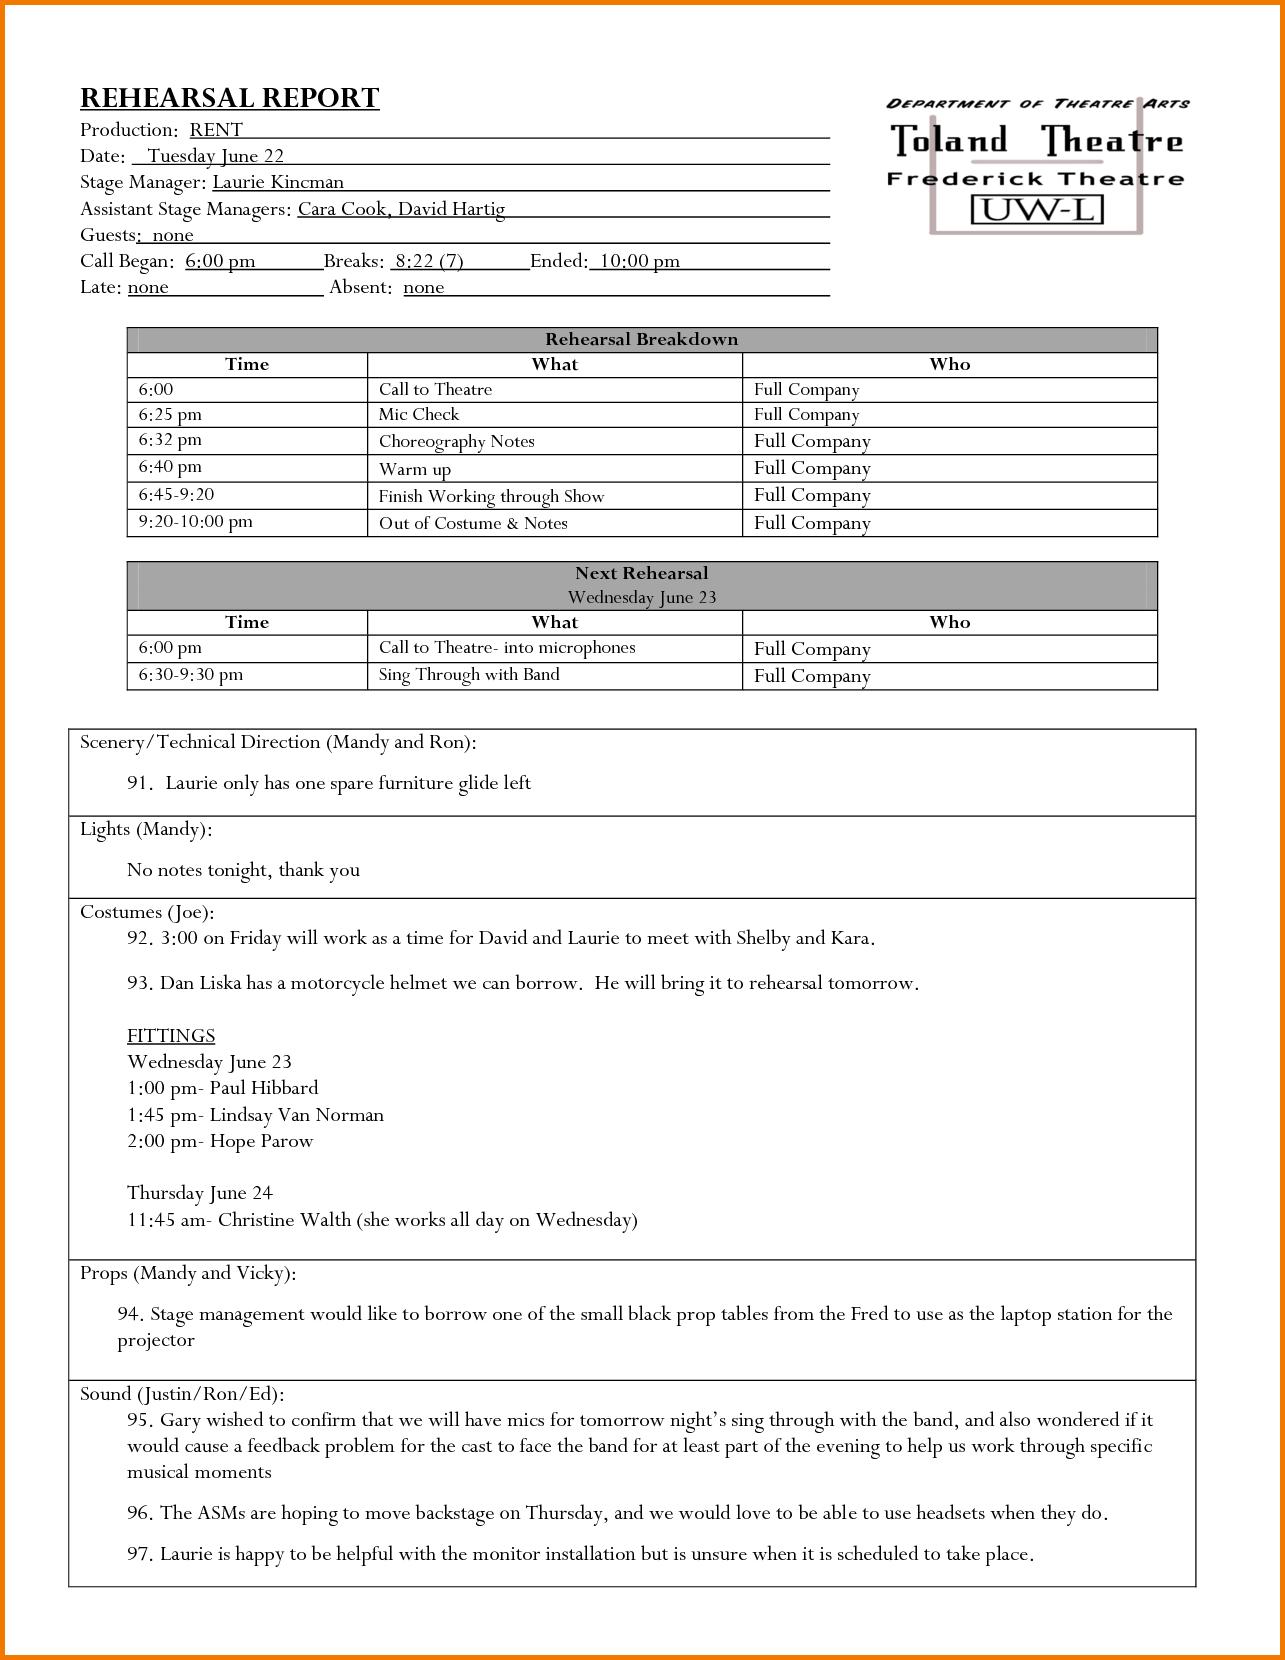 Rehearsal report template editable digital expense stage manager rehearsal report template editable digital expense report template templates home design free maxwellsz